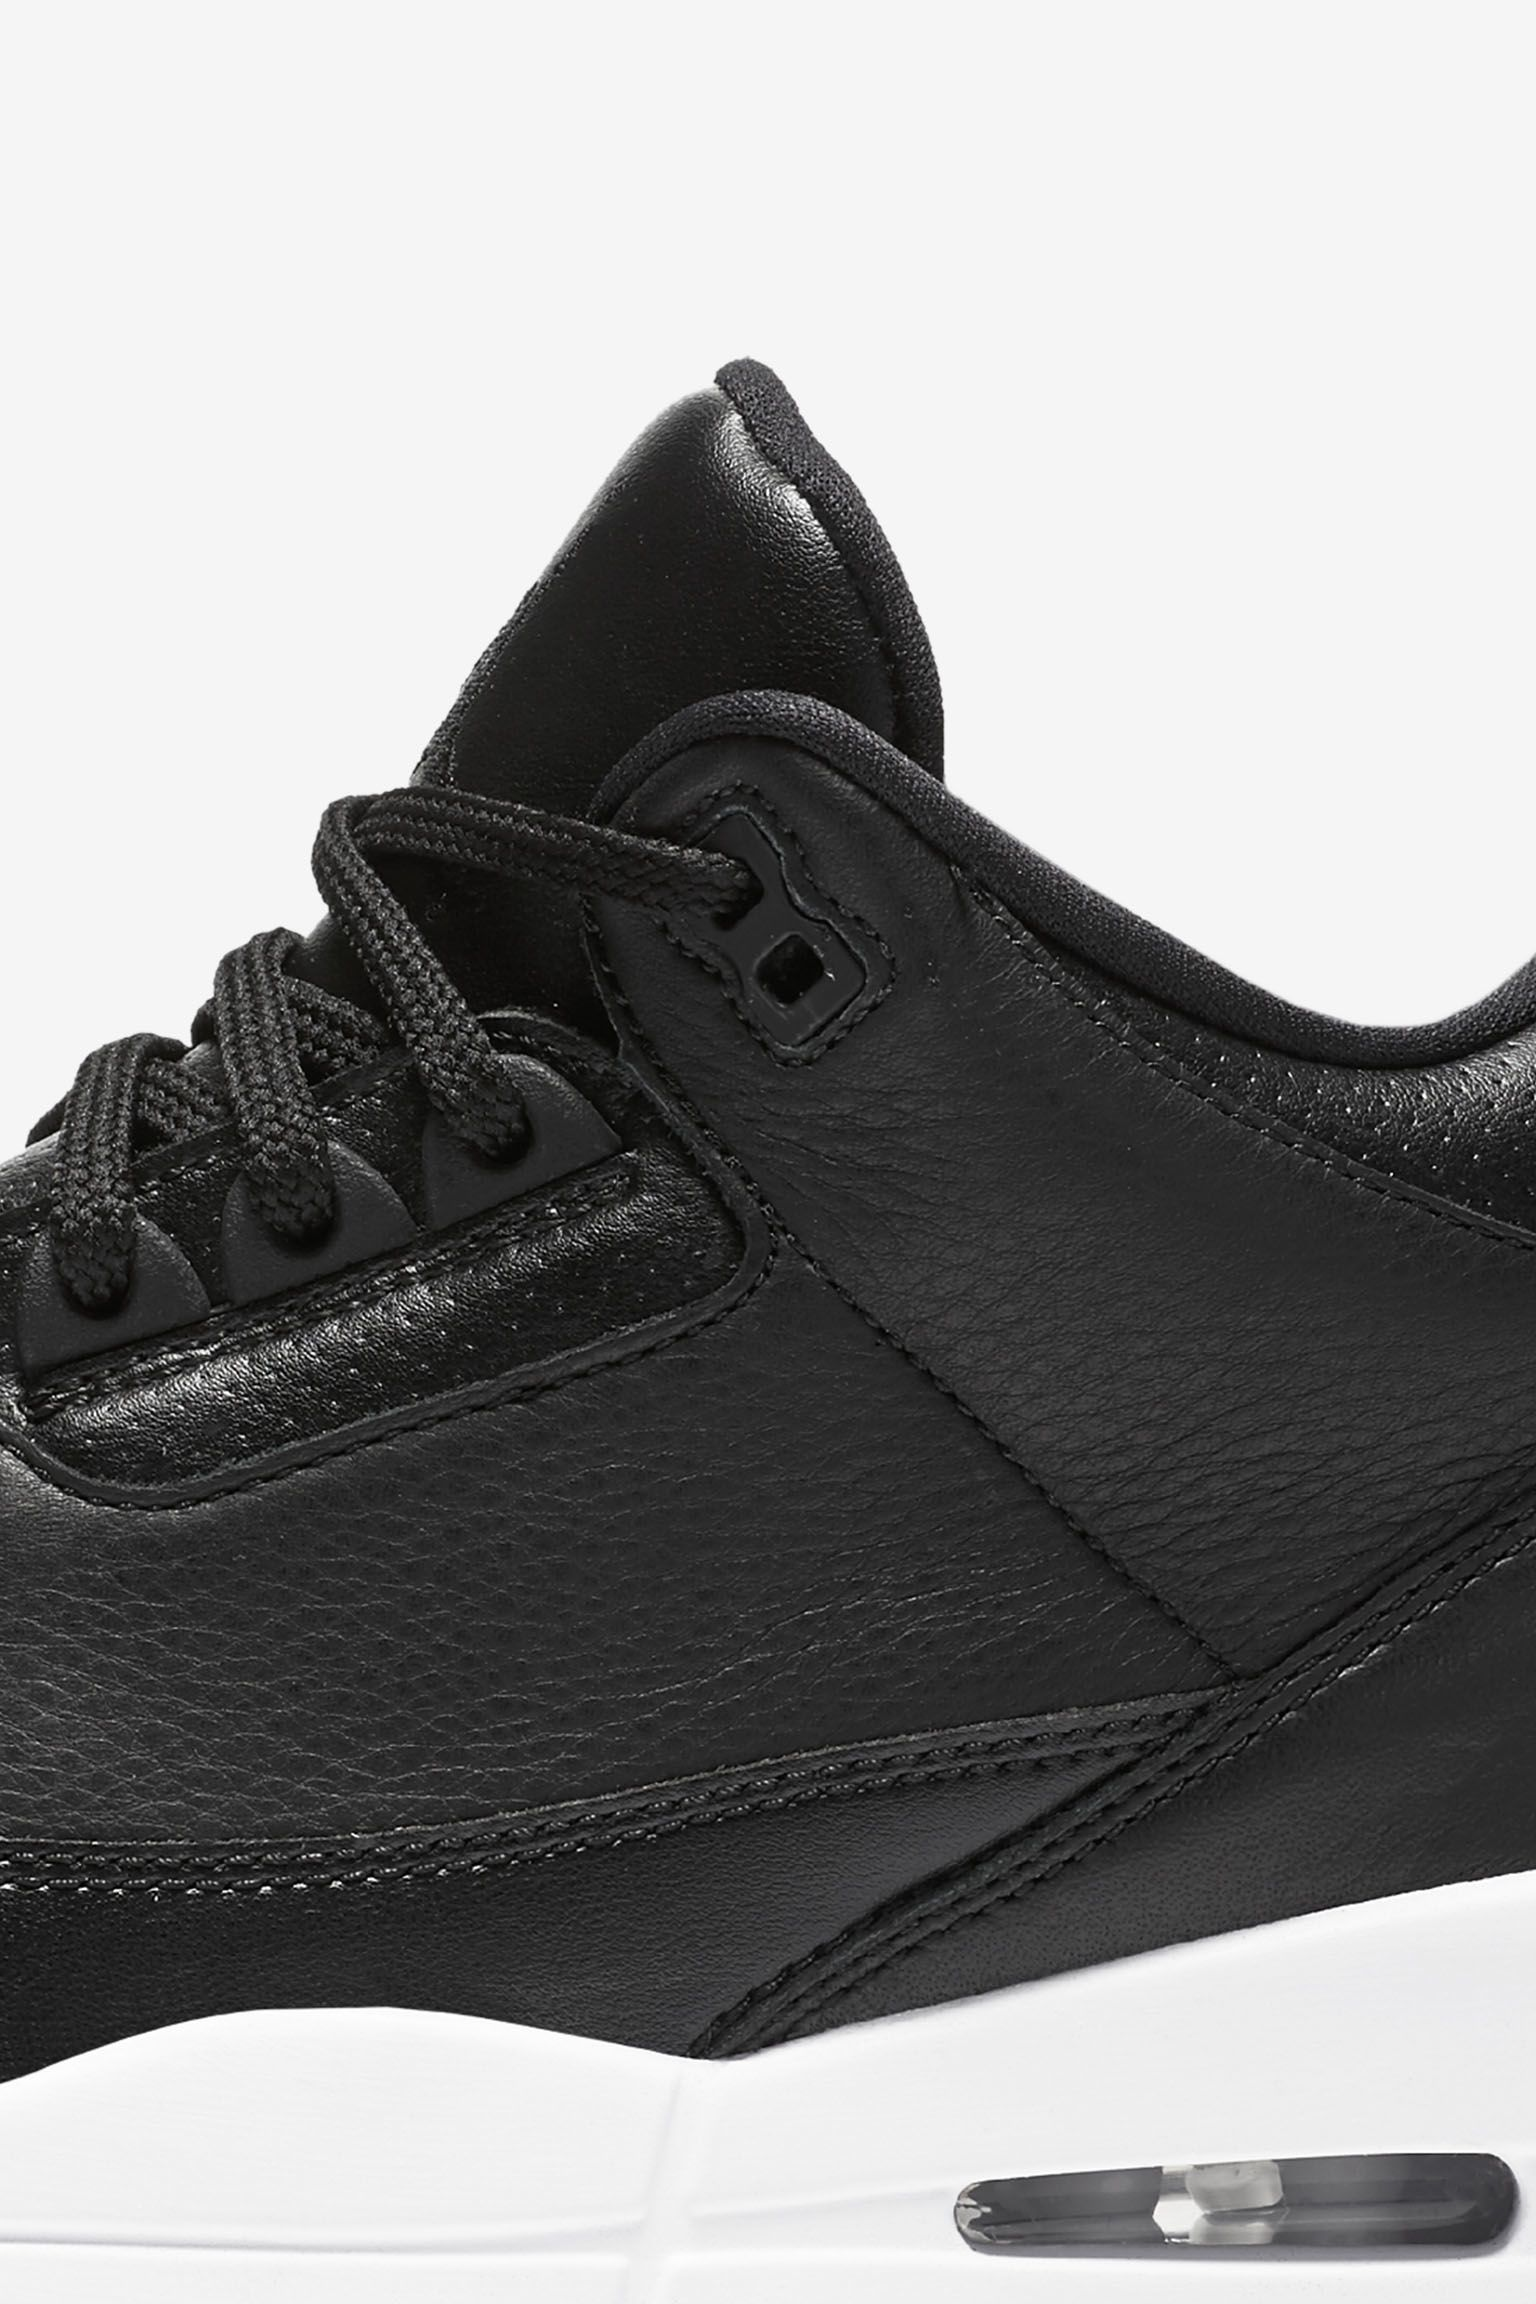 Air Jordan 3 Retro 'Black & White' Release Date